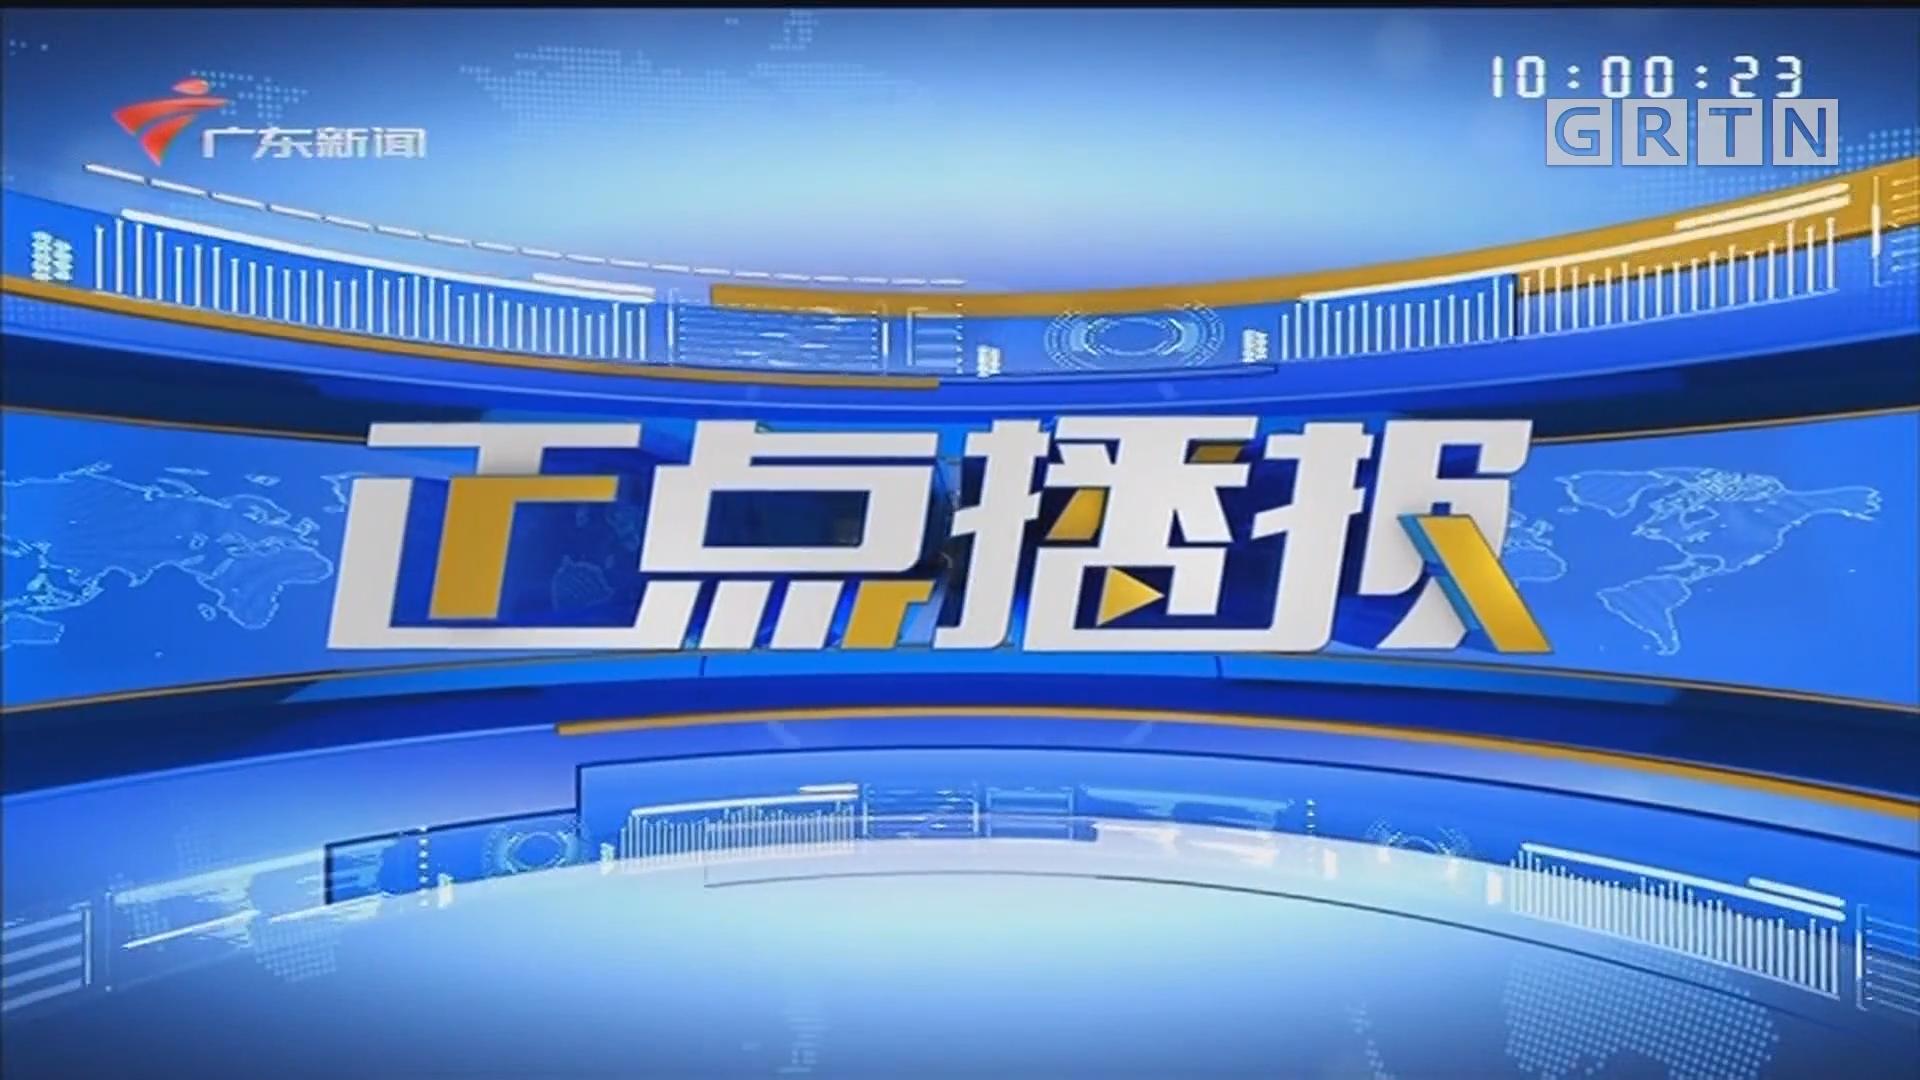 [HD][2020-02-23-10:00]正点播报:22日广东新增确诊3例:广州2例 东莞1例